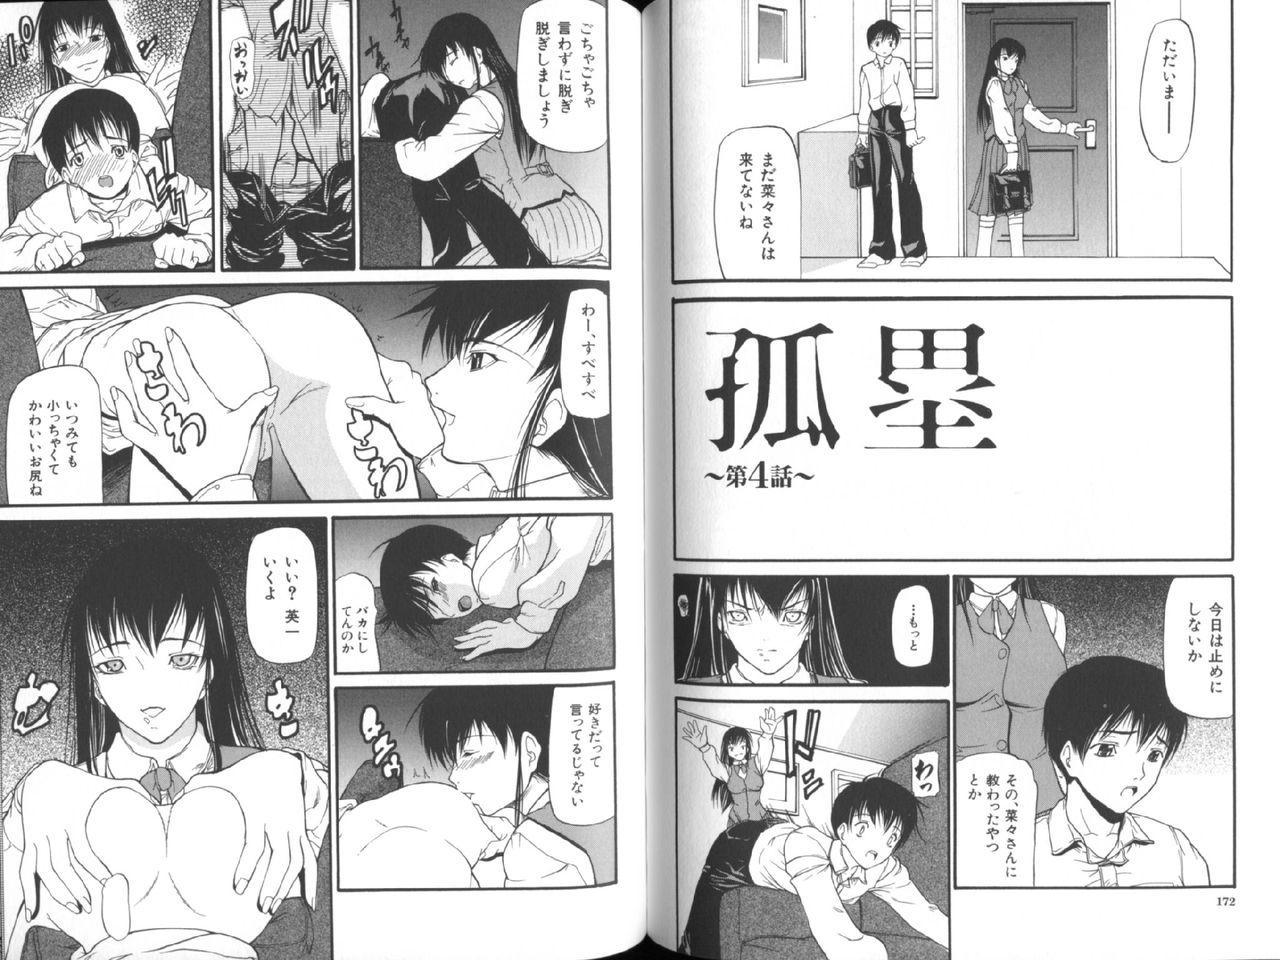 Senjou - A Desire is Instigated 87